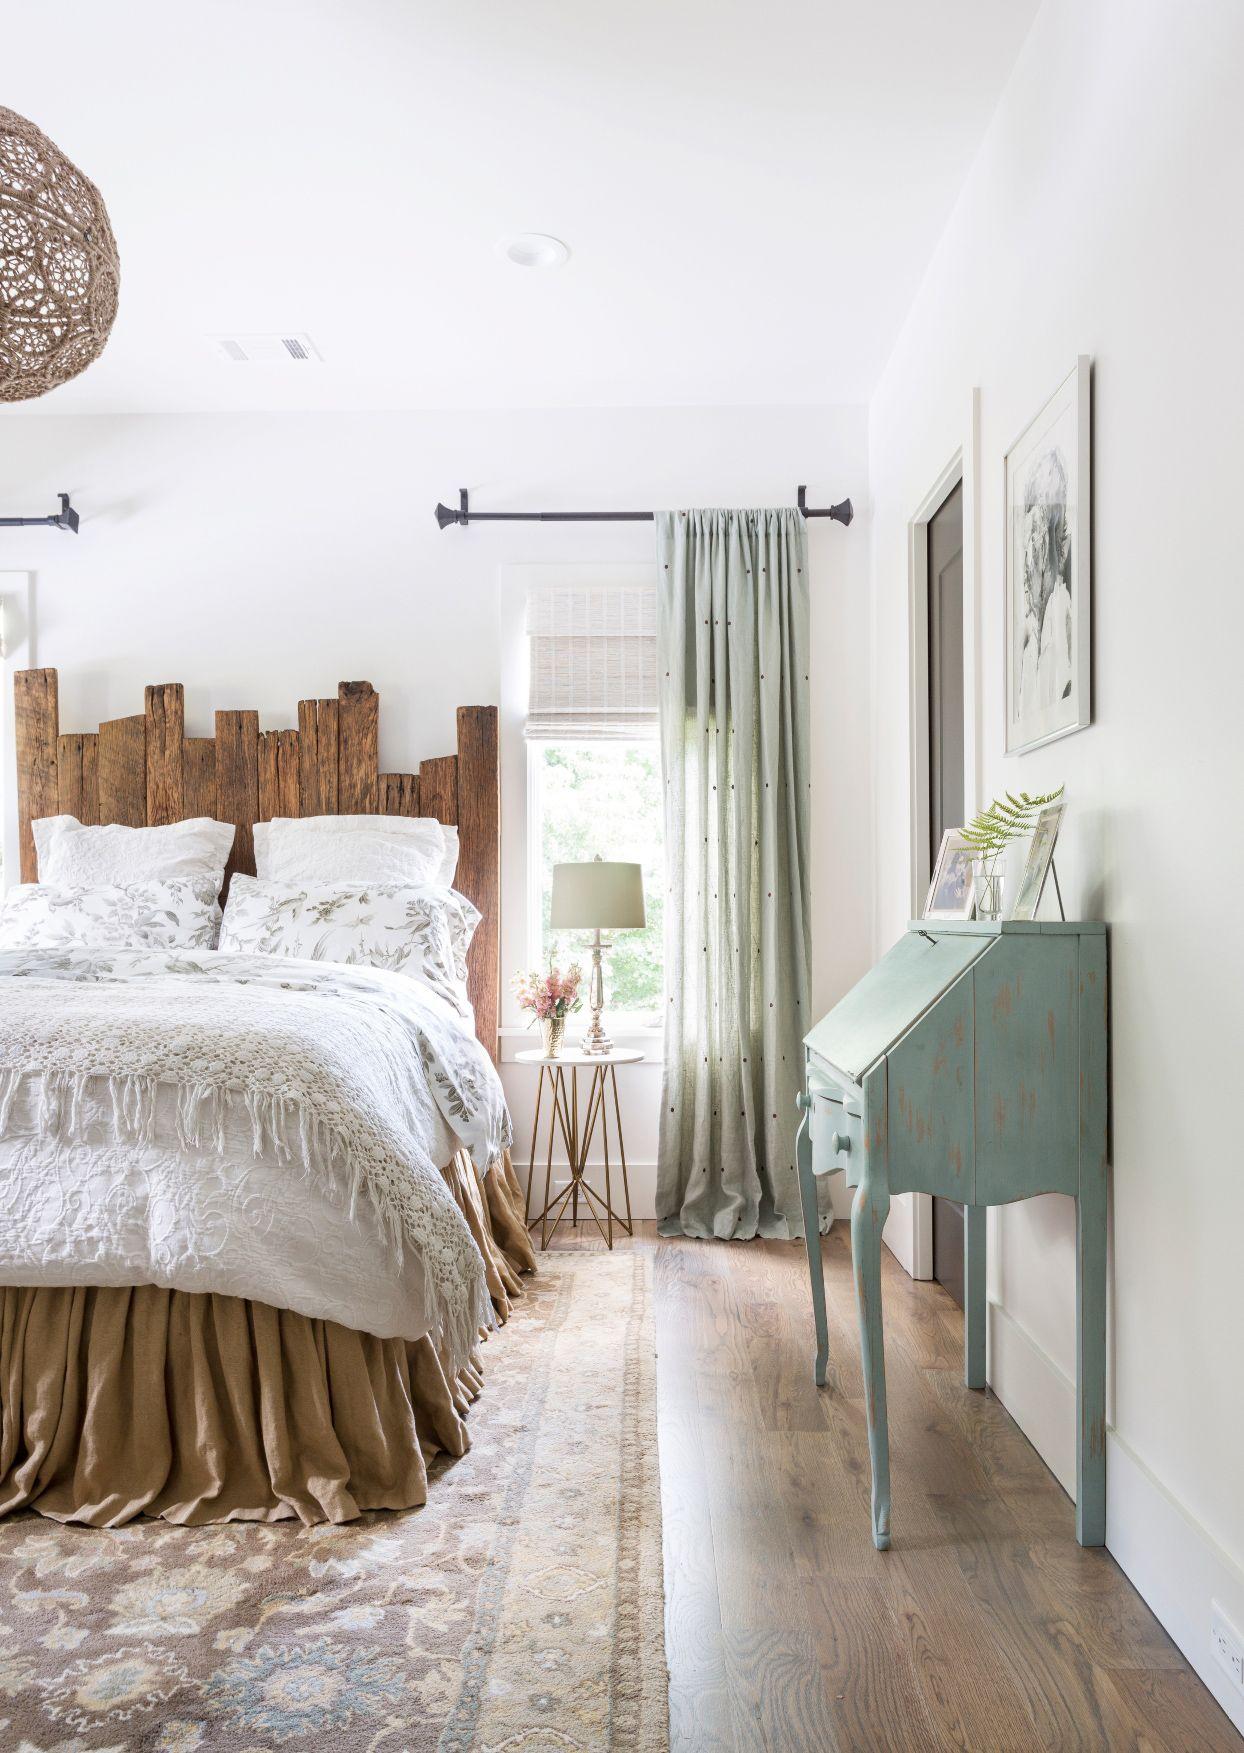 15 Cozy Bedrooms That Nail the Farmhouse Aesthetic White